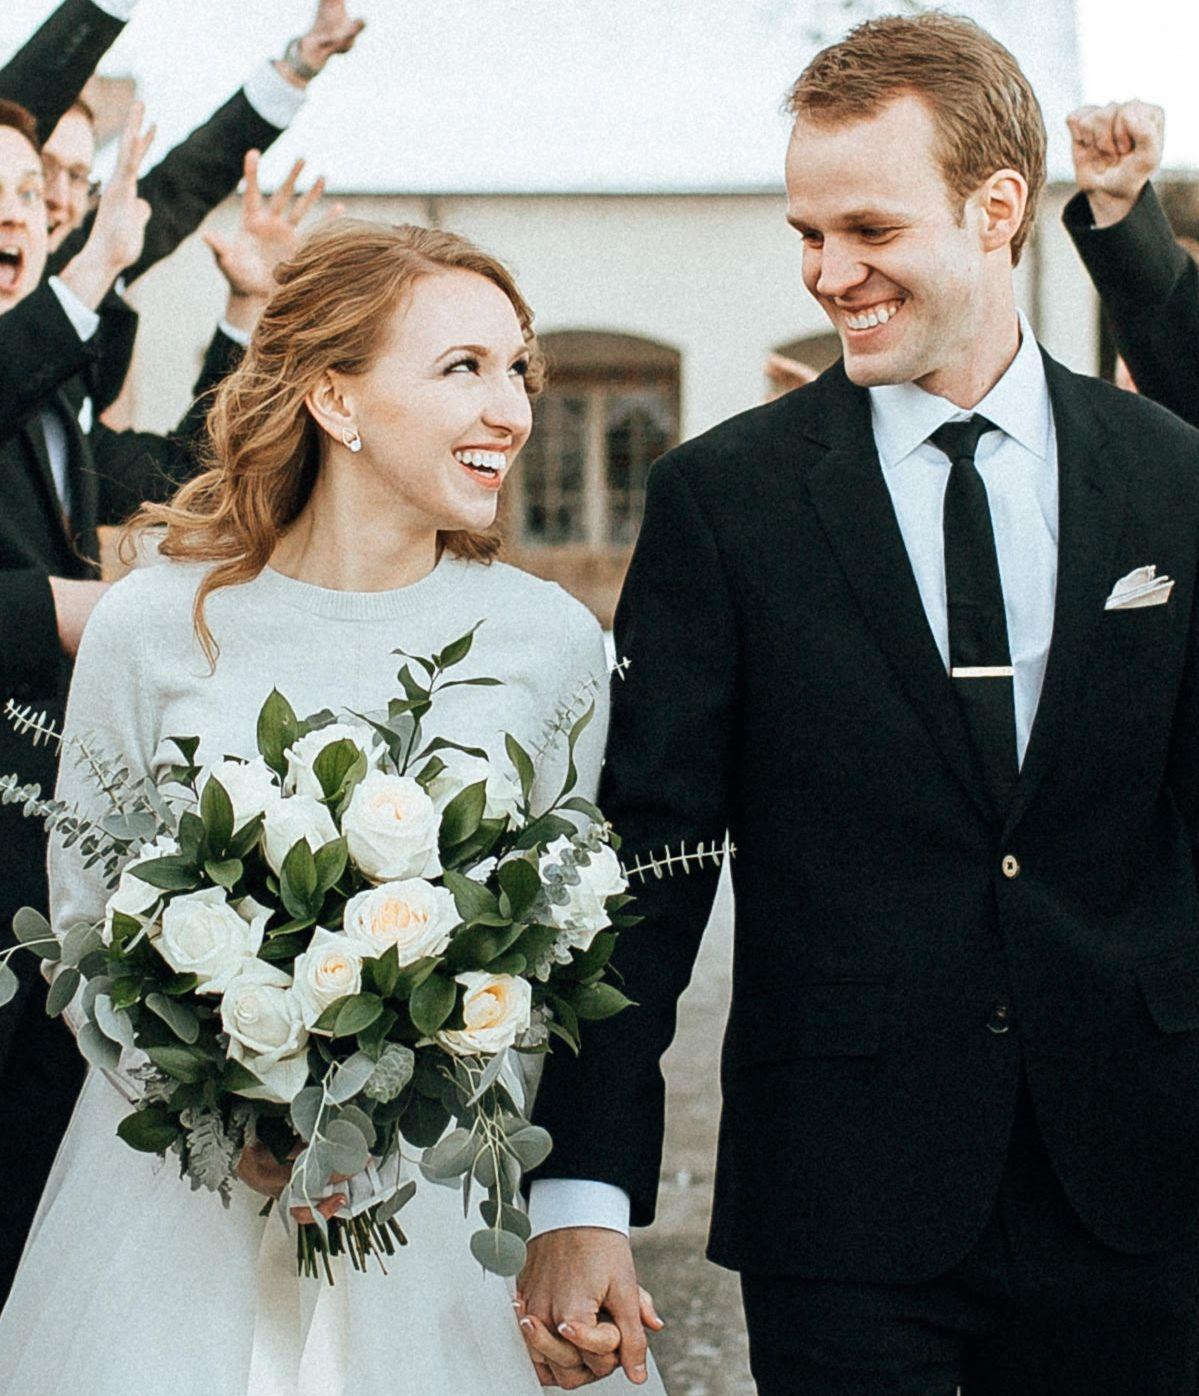 Brides bouquet, wedding flowers, white roses, baby blue eucalyptus ...